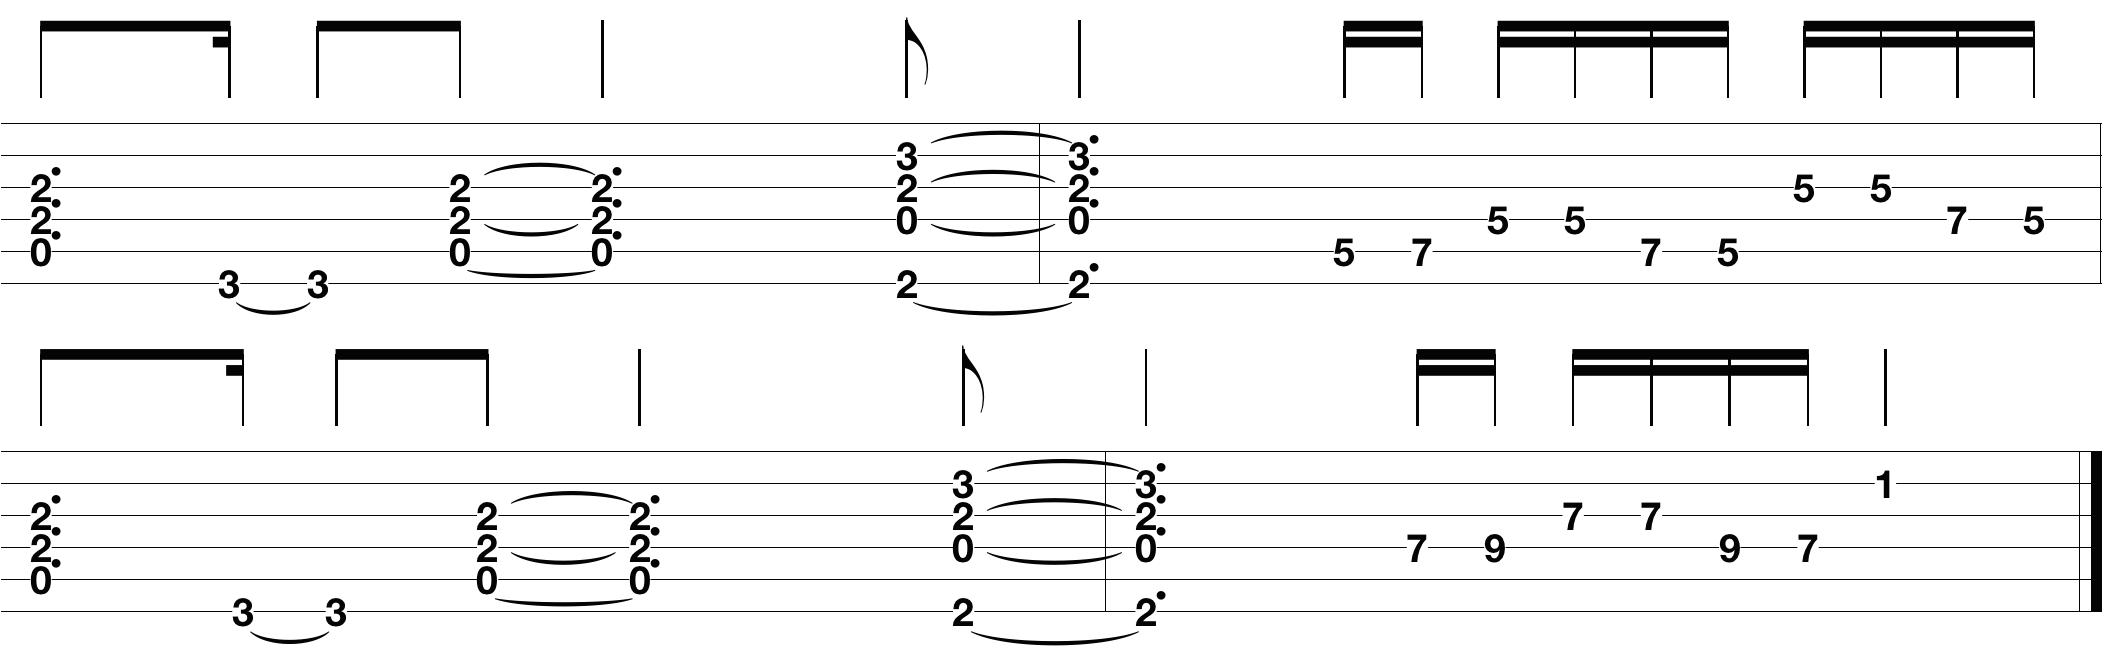 electric-guitar-riff_2.png